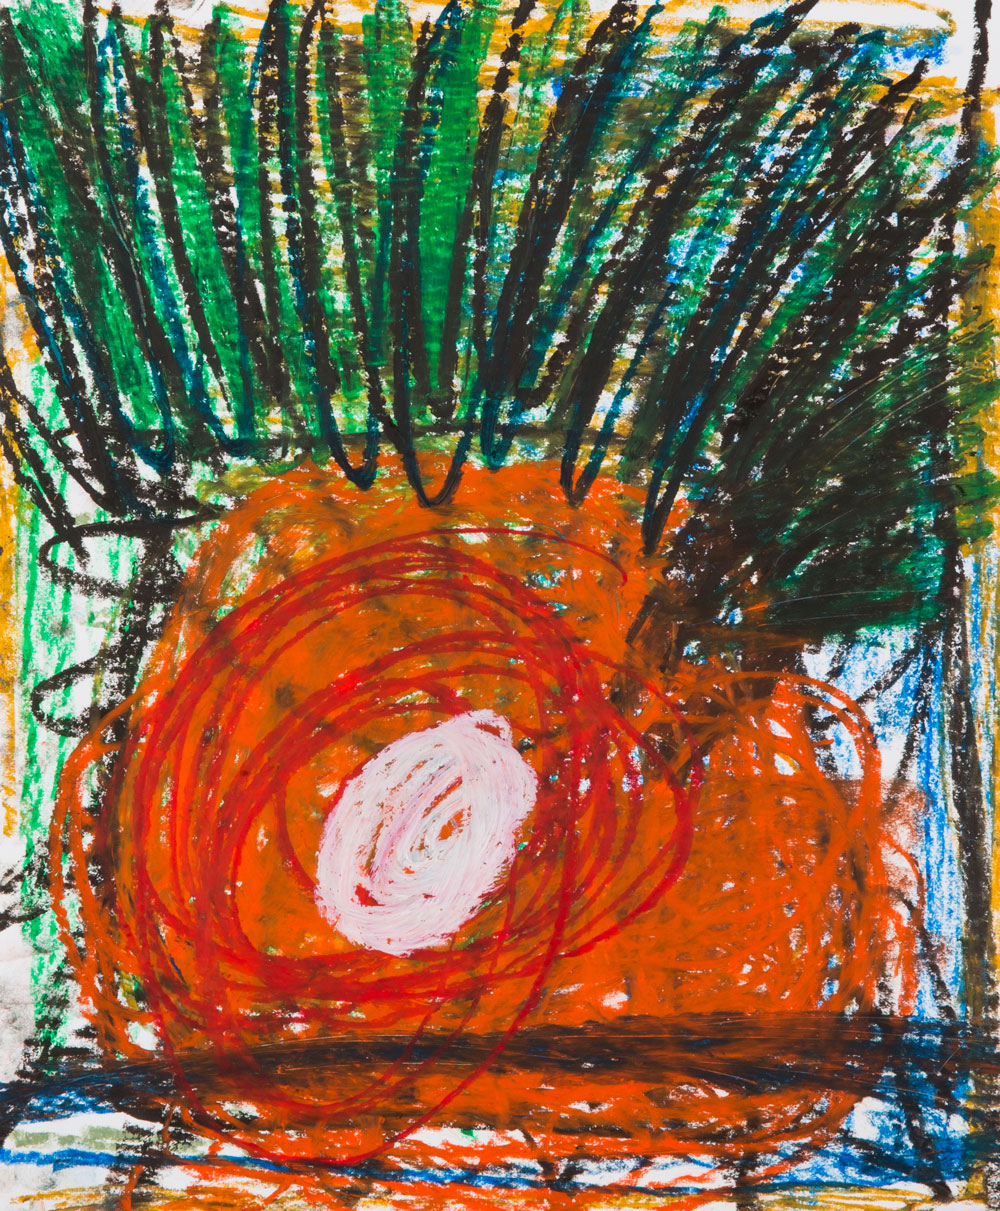 Orange Crush  , oil pastel on paper, 17x14 in. ©Denise Gale 2016